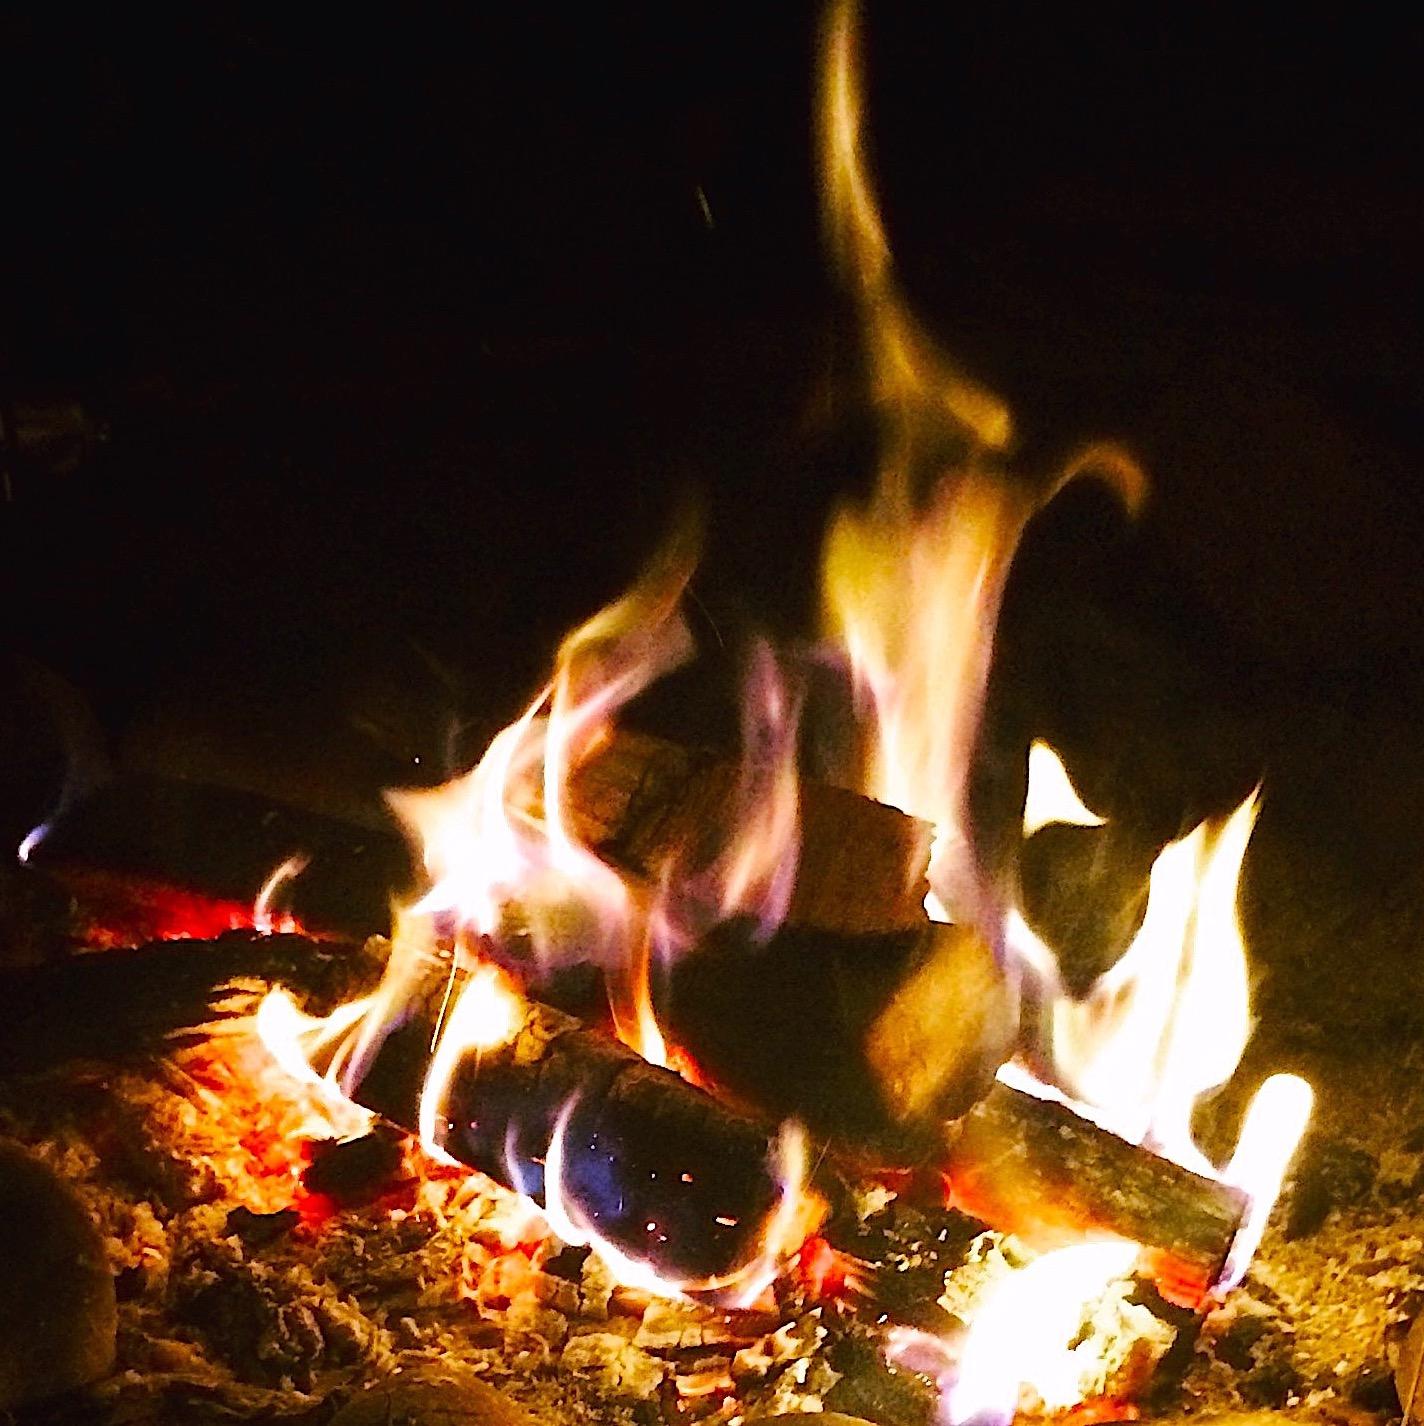 #fuoco – Equinozio D'autunno 2021